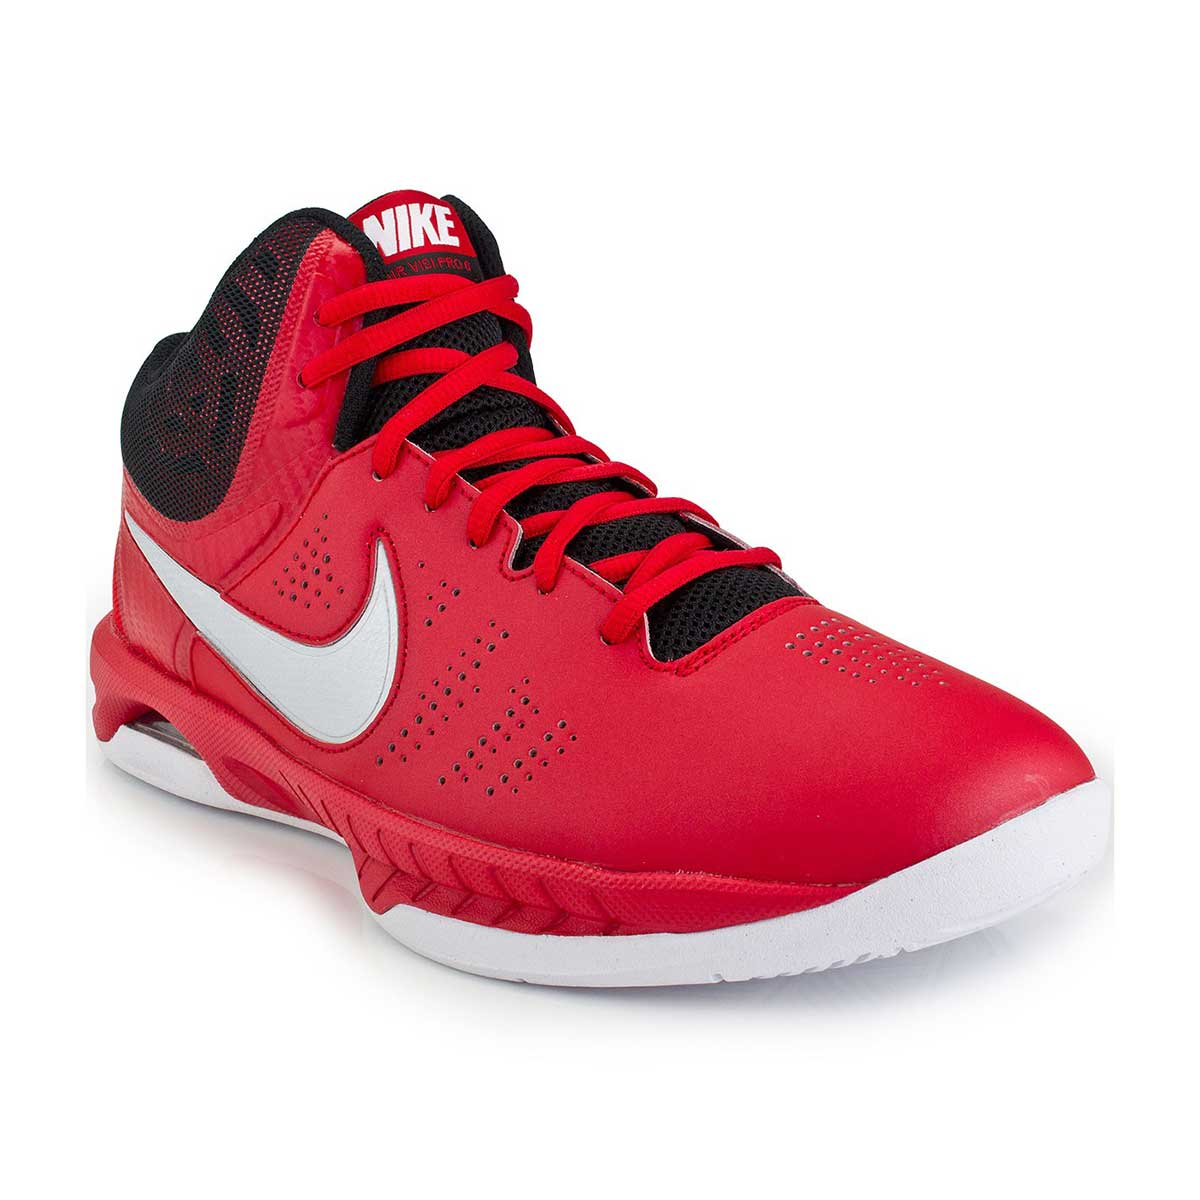 Basketball Shoes, Basketball, Sports, Buy, Nike, Nike Air Visi Pro VI Basketball  Shoes